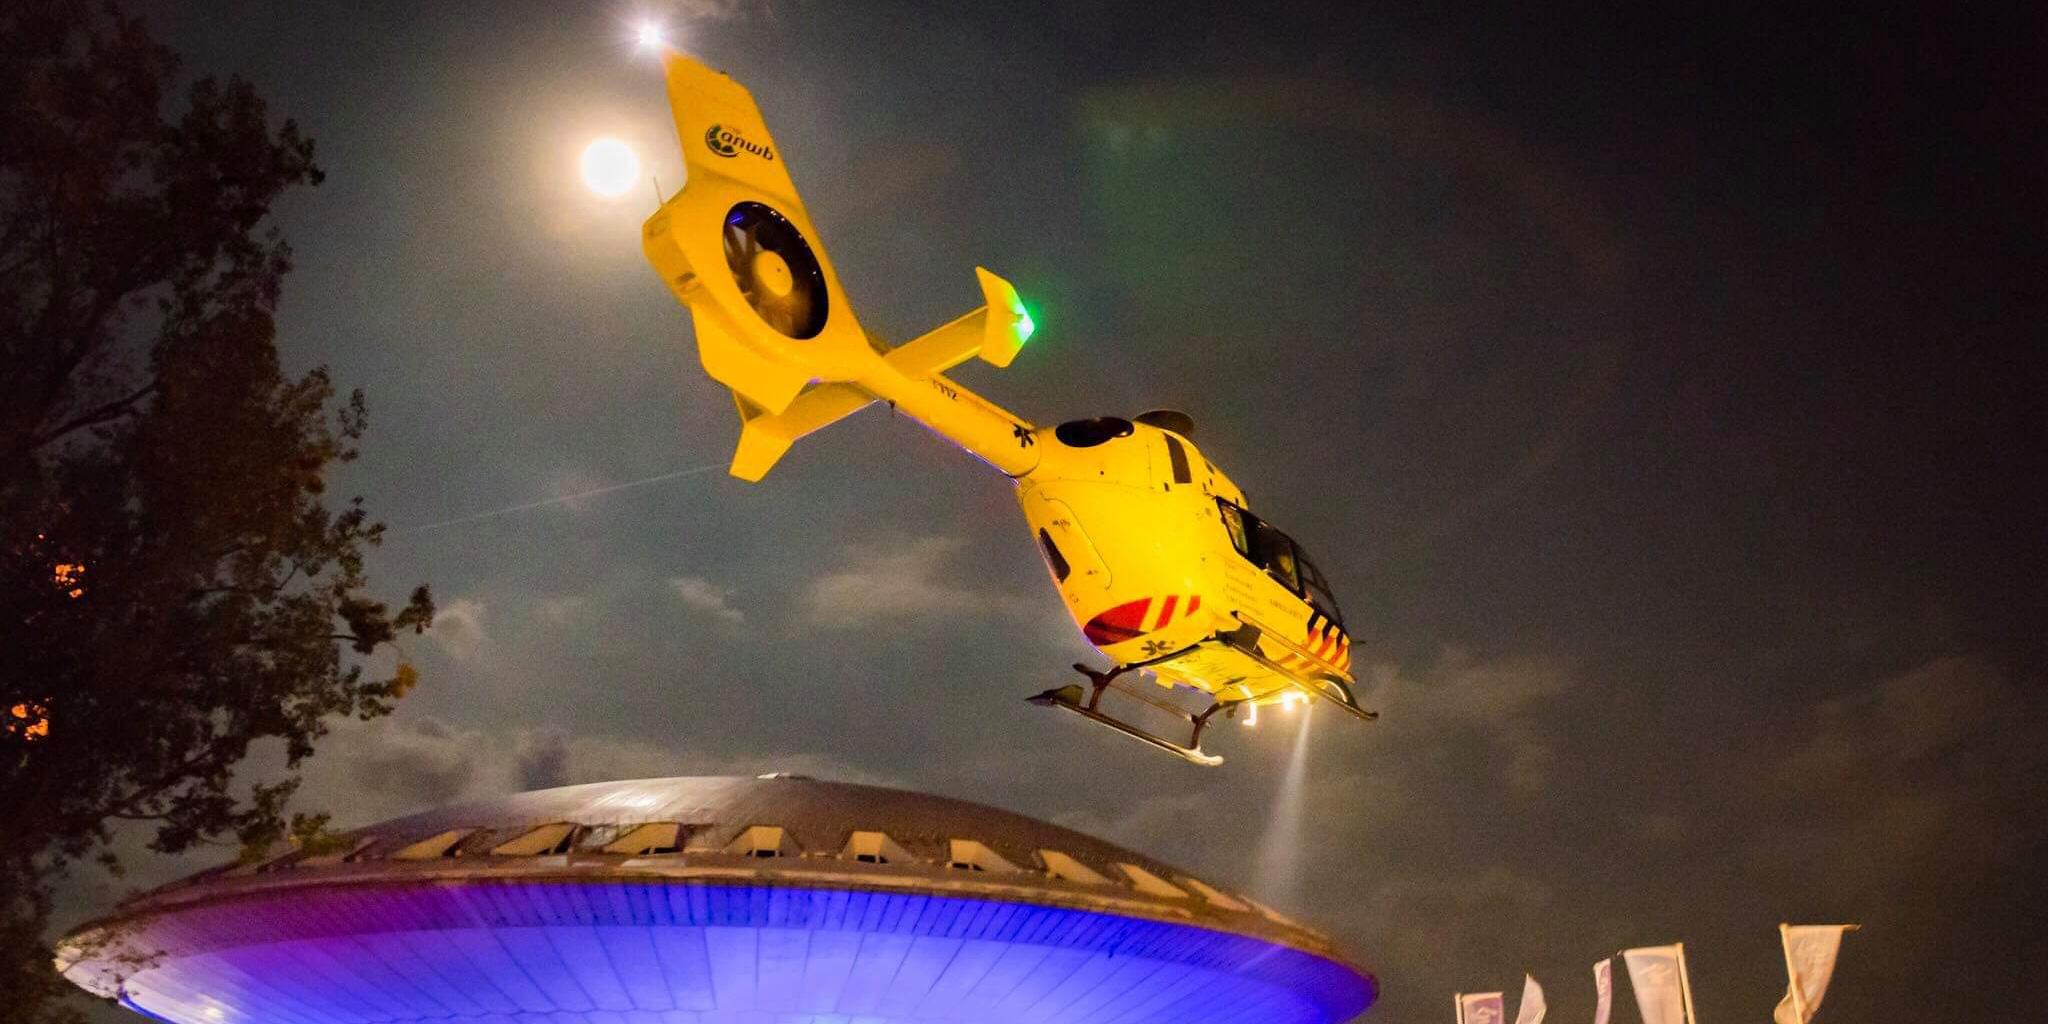 460 Likes Instagram LFL03 Eindhoven Emergency Response